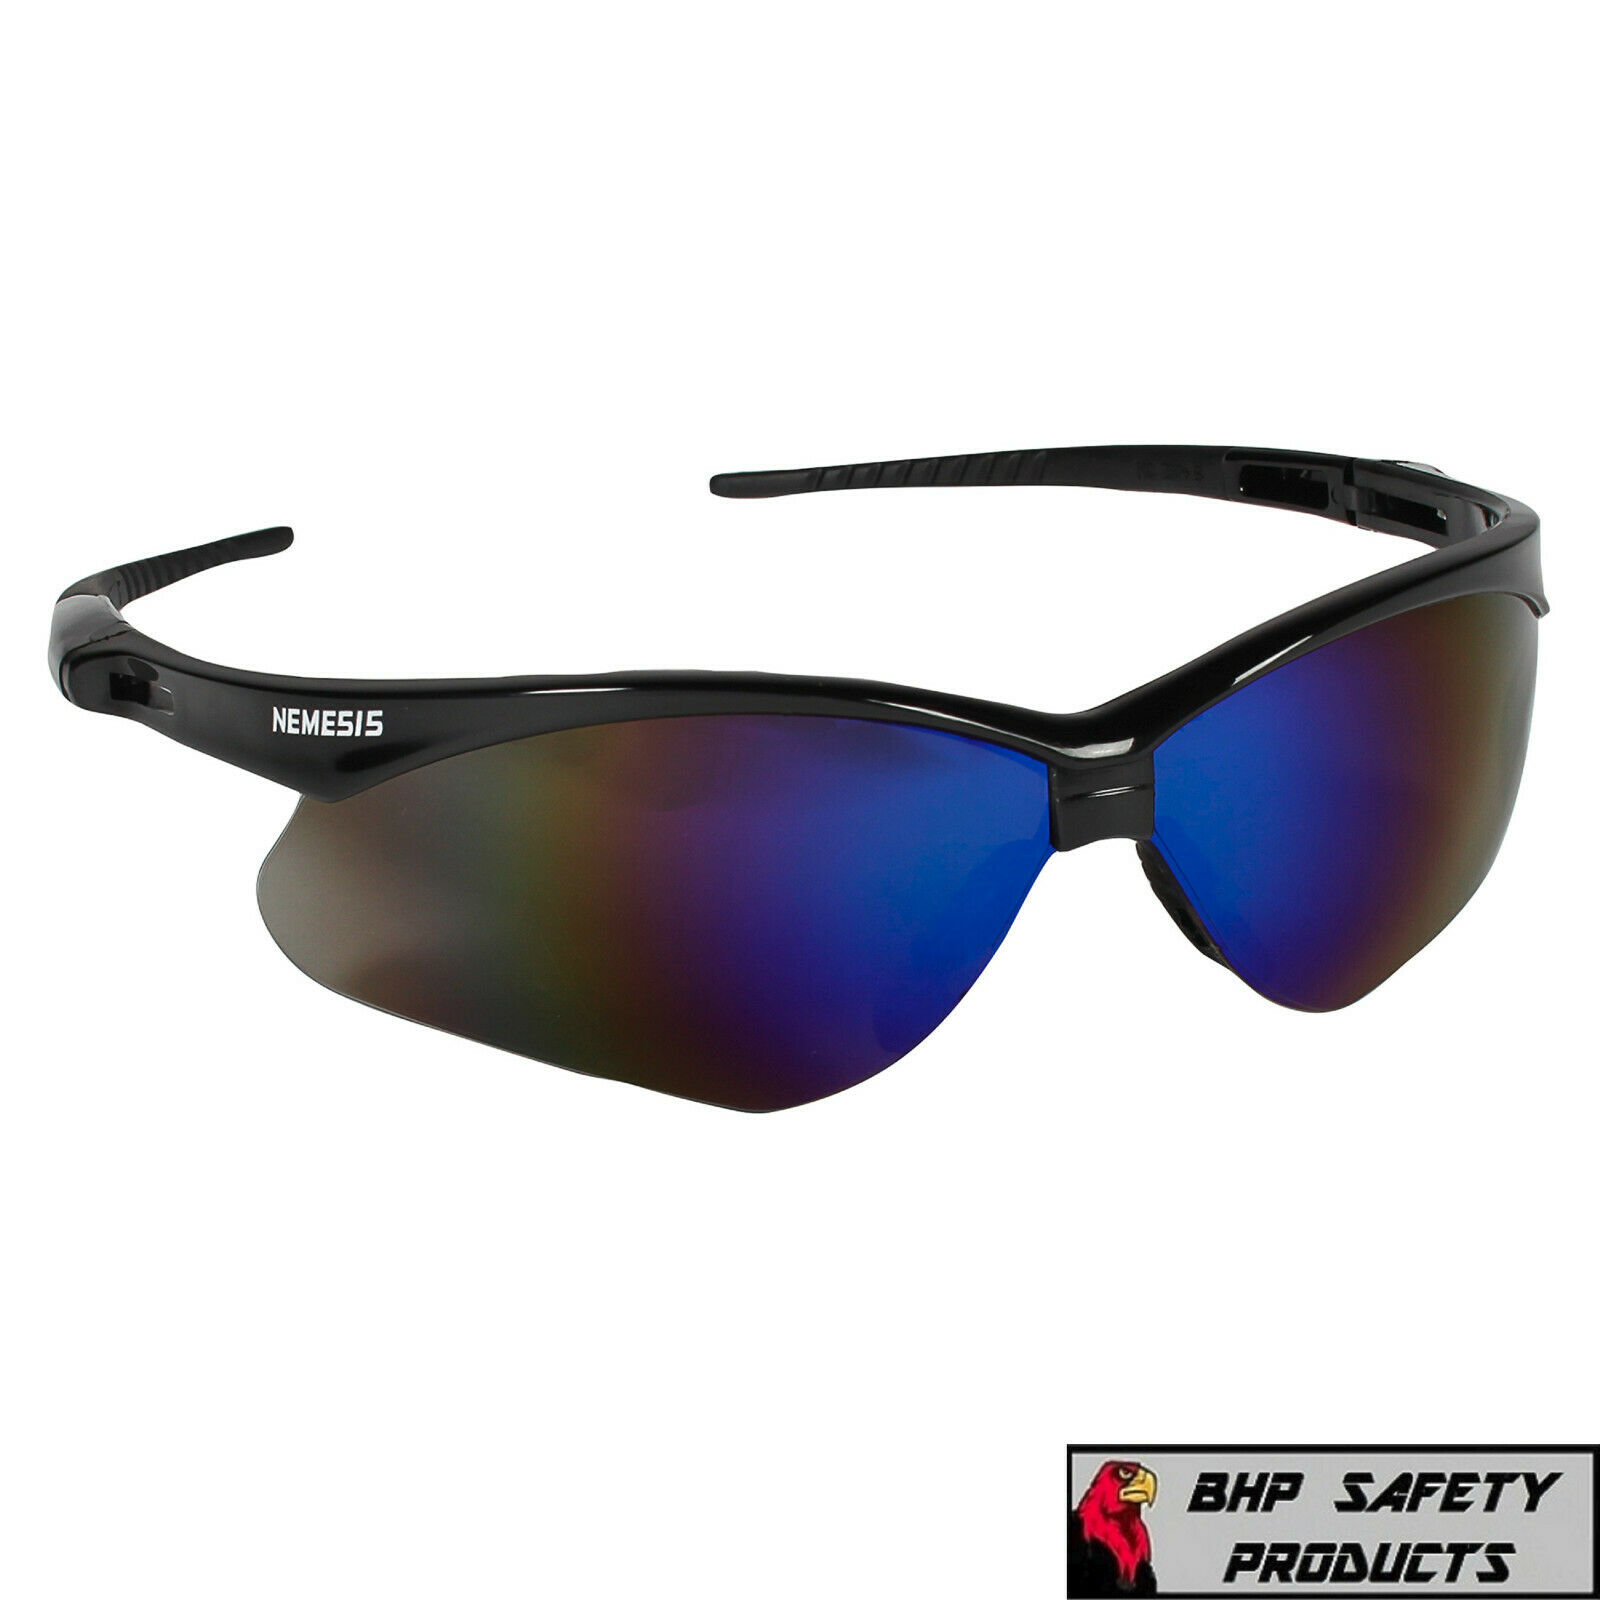 JACKSON NEMESIS SAFETY GLASSES SUNGLASSES SPORT WORK EYEWEAR - VARIETY PACKS 14481- Black Frame/Blue Mirror Lens